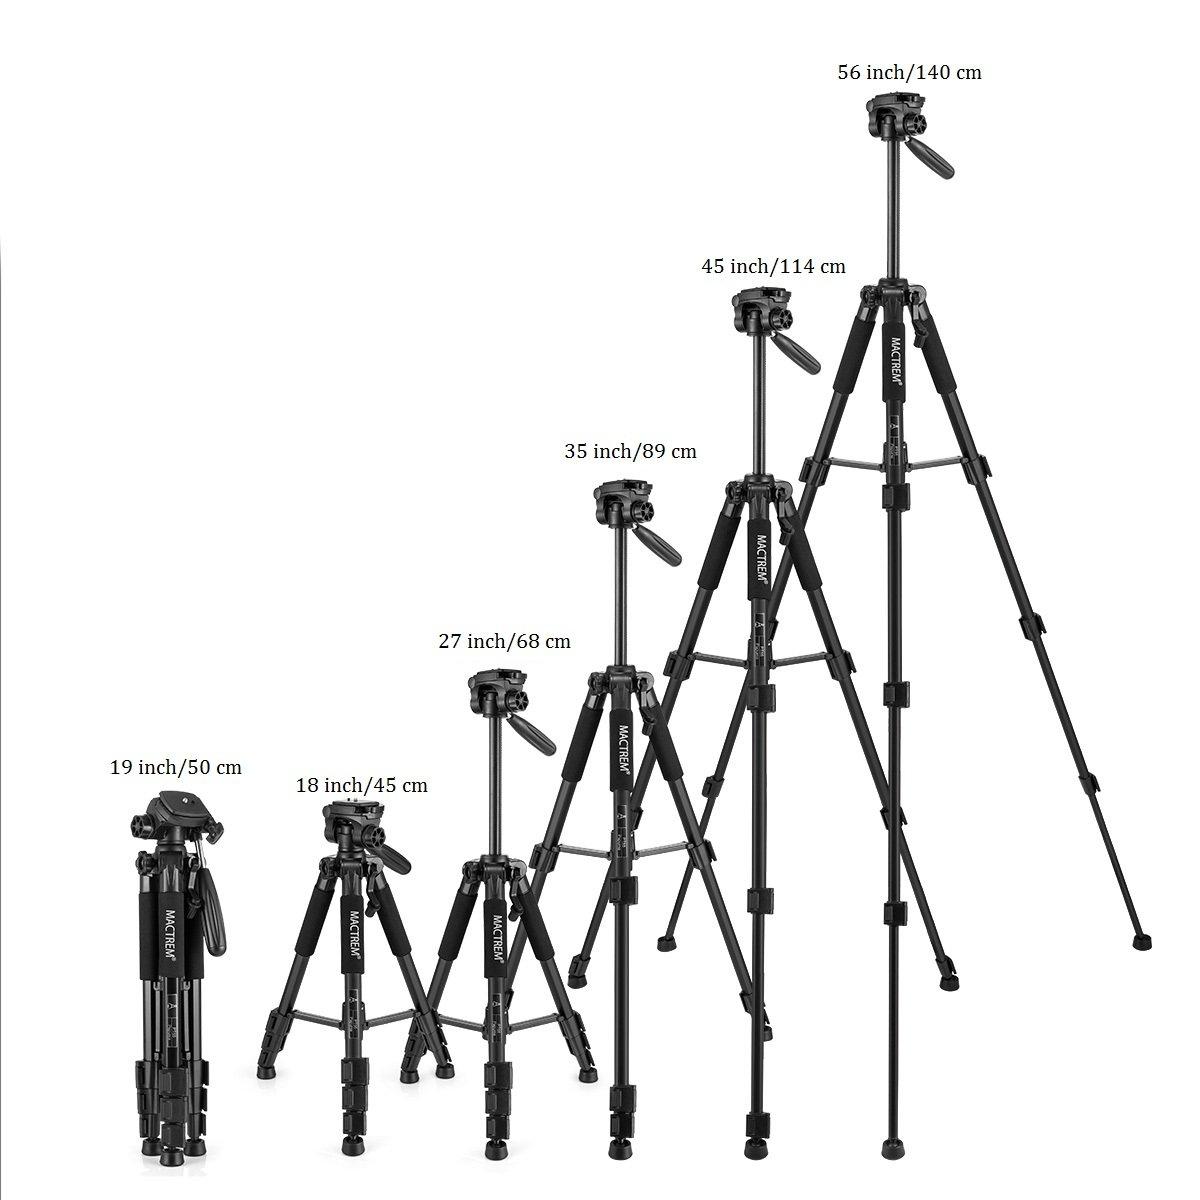 Stativkamera Reflex - Mactrem Flexibles Vollstativ PT55 mit Kugelkopf für DSLR EOS Canon Nikon SONY - Reisestativ (Schwarz)